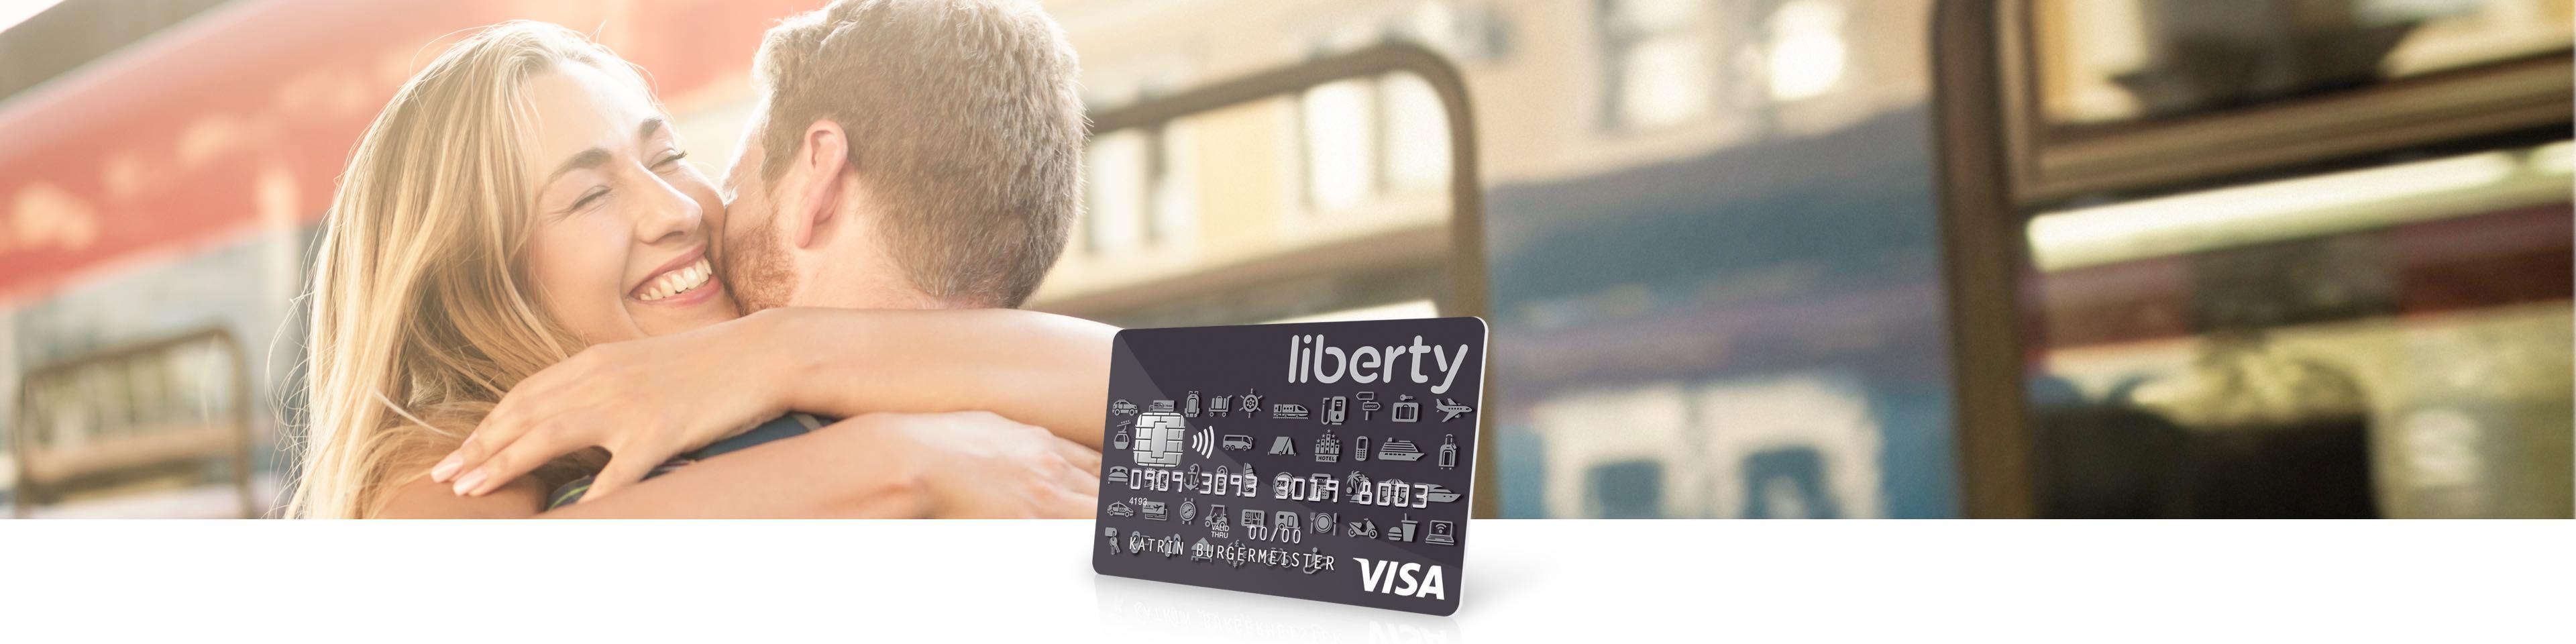 Visa LibertyCard Plus Kreditkarte